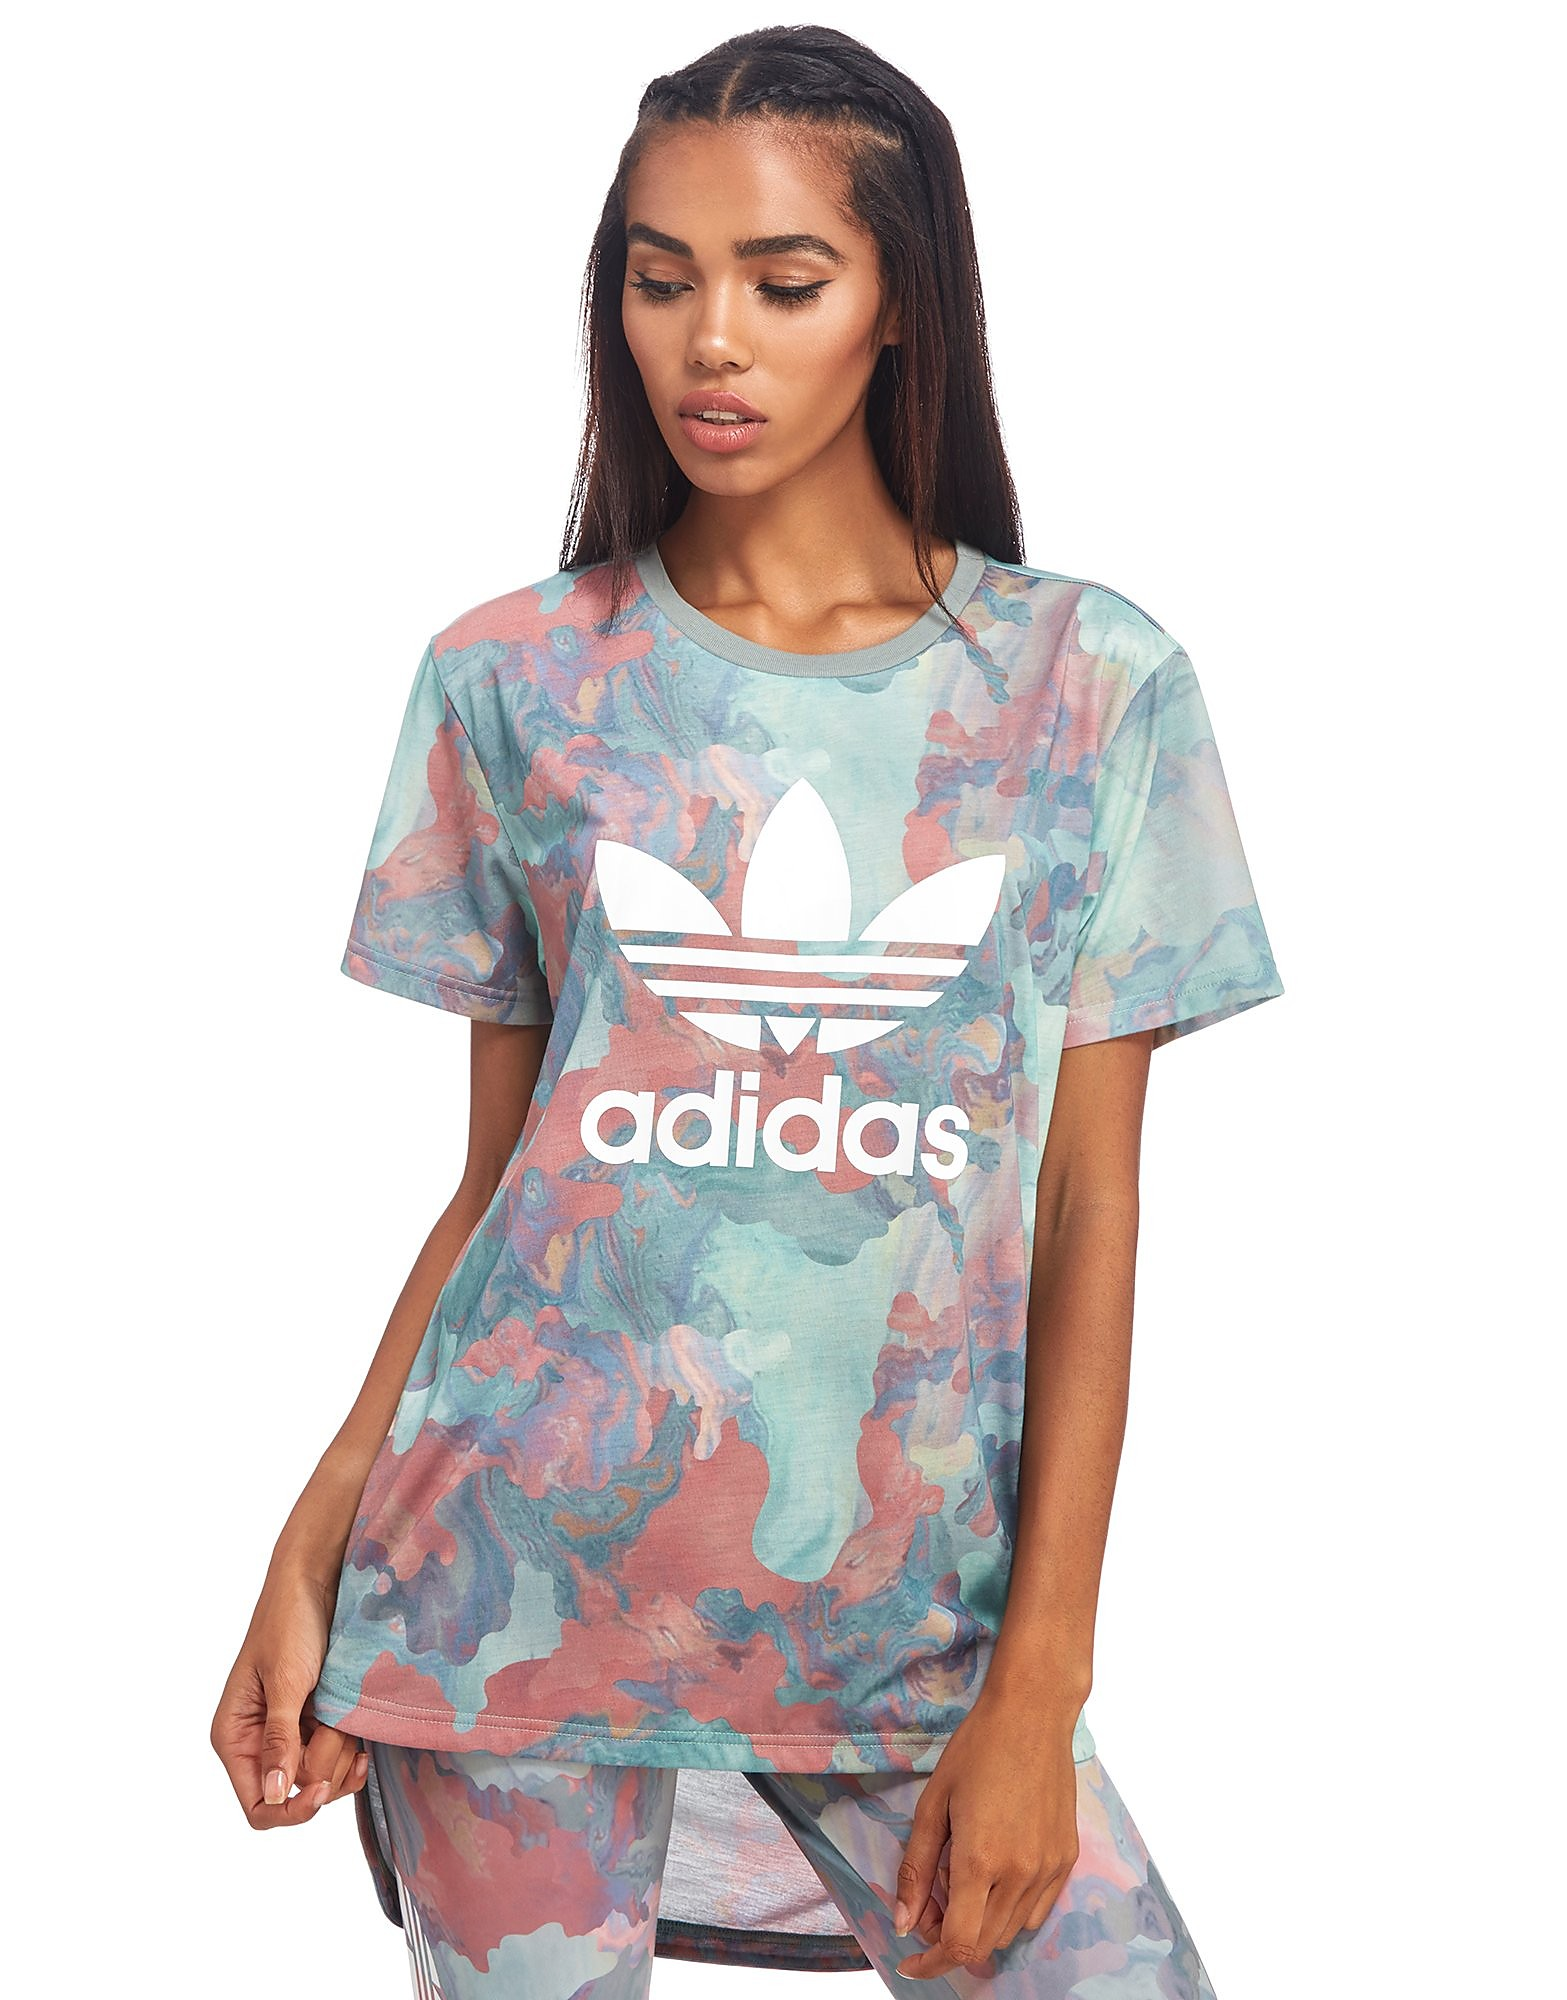 adidas Originals Pastel Camo T-Shirt